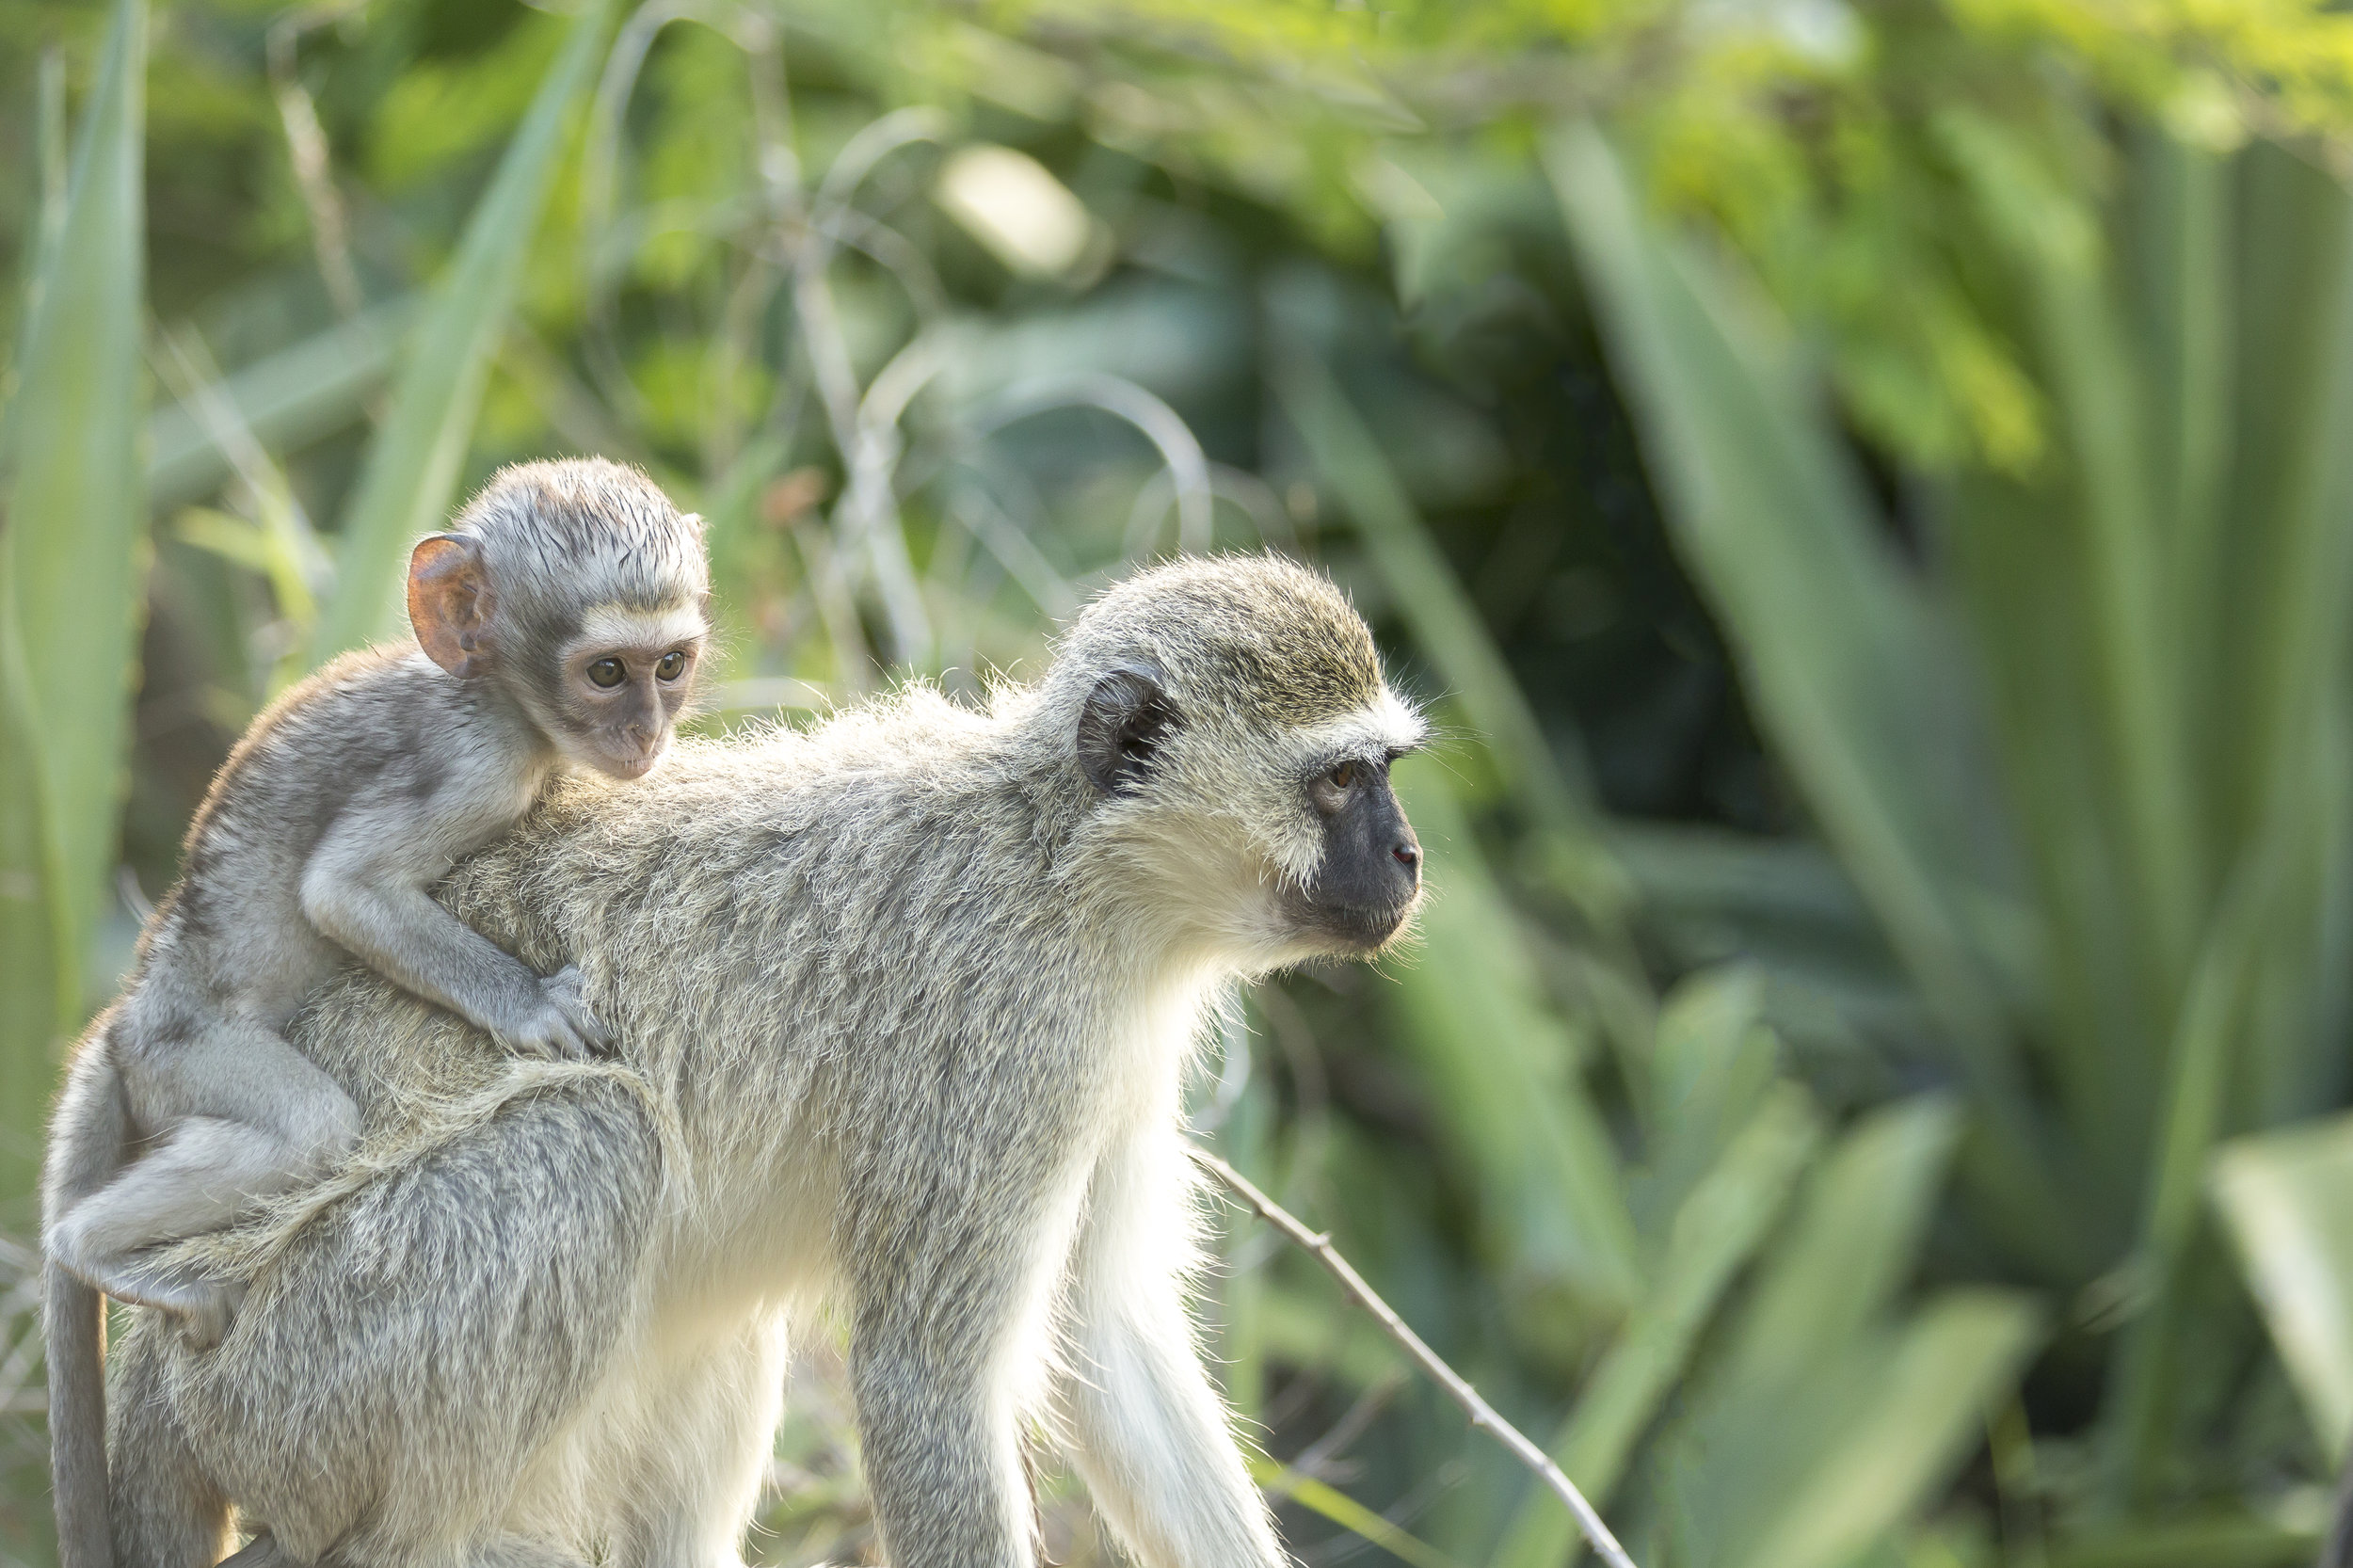 Monkeys-1.jpg